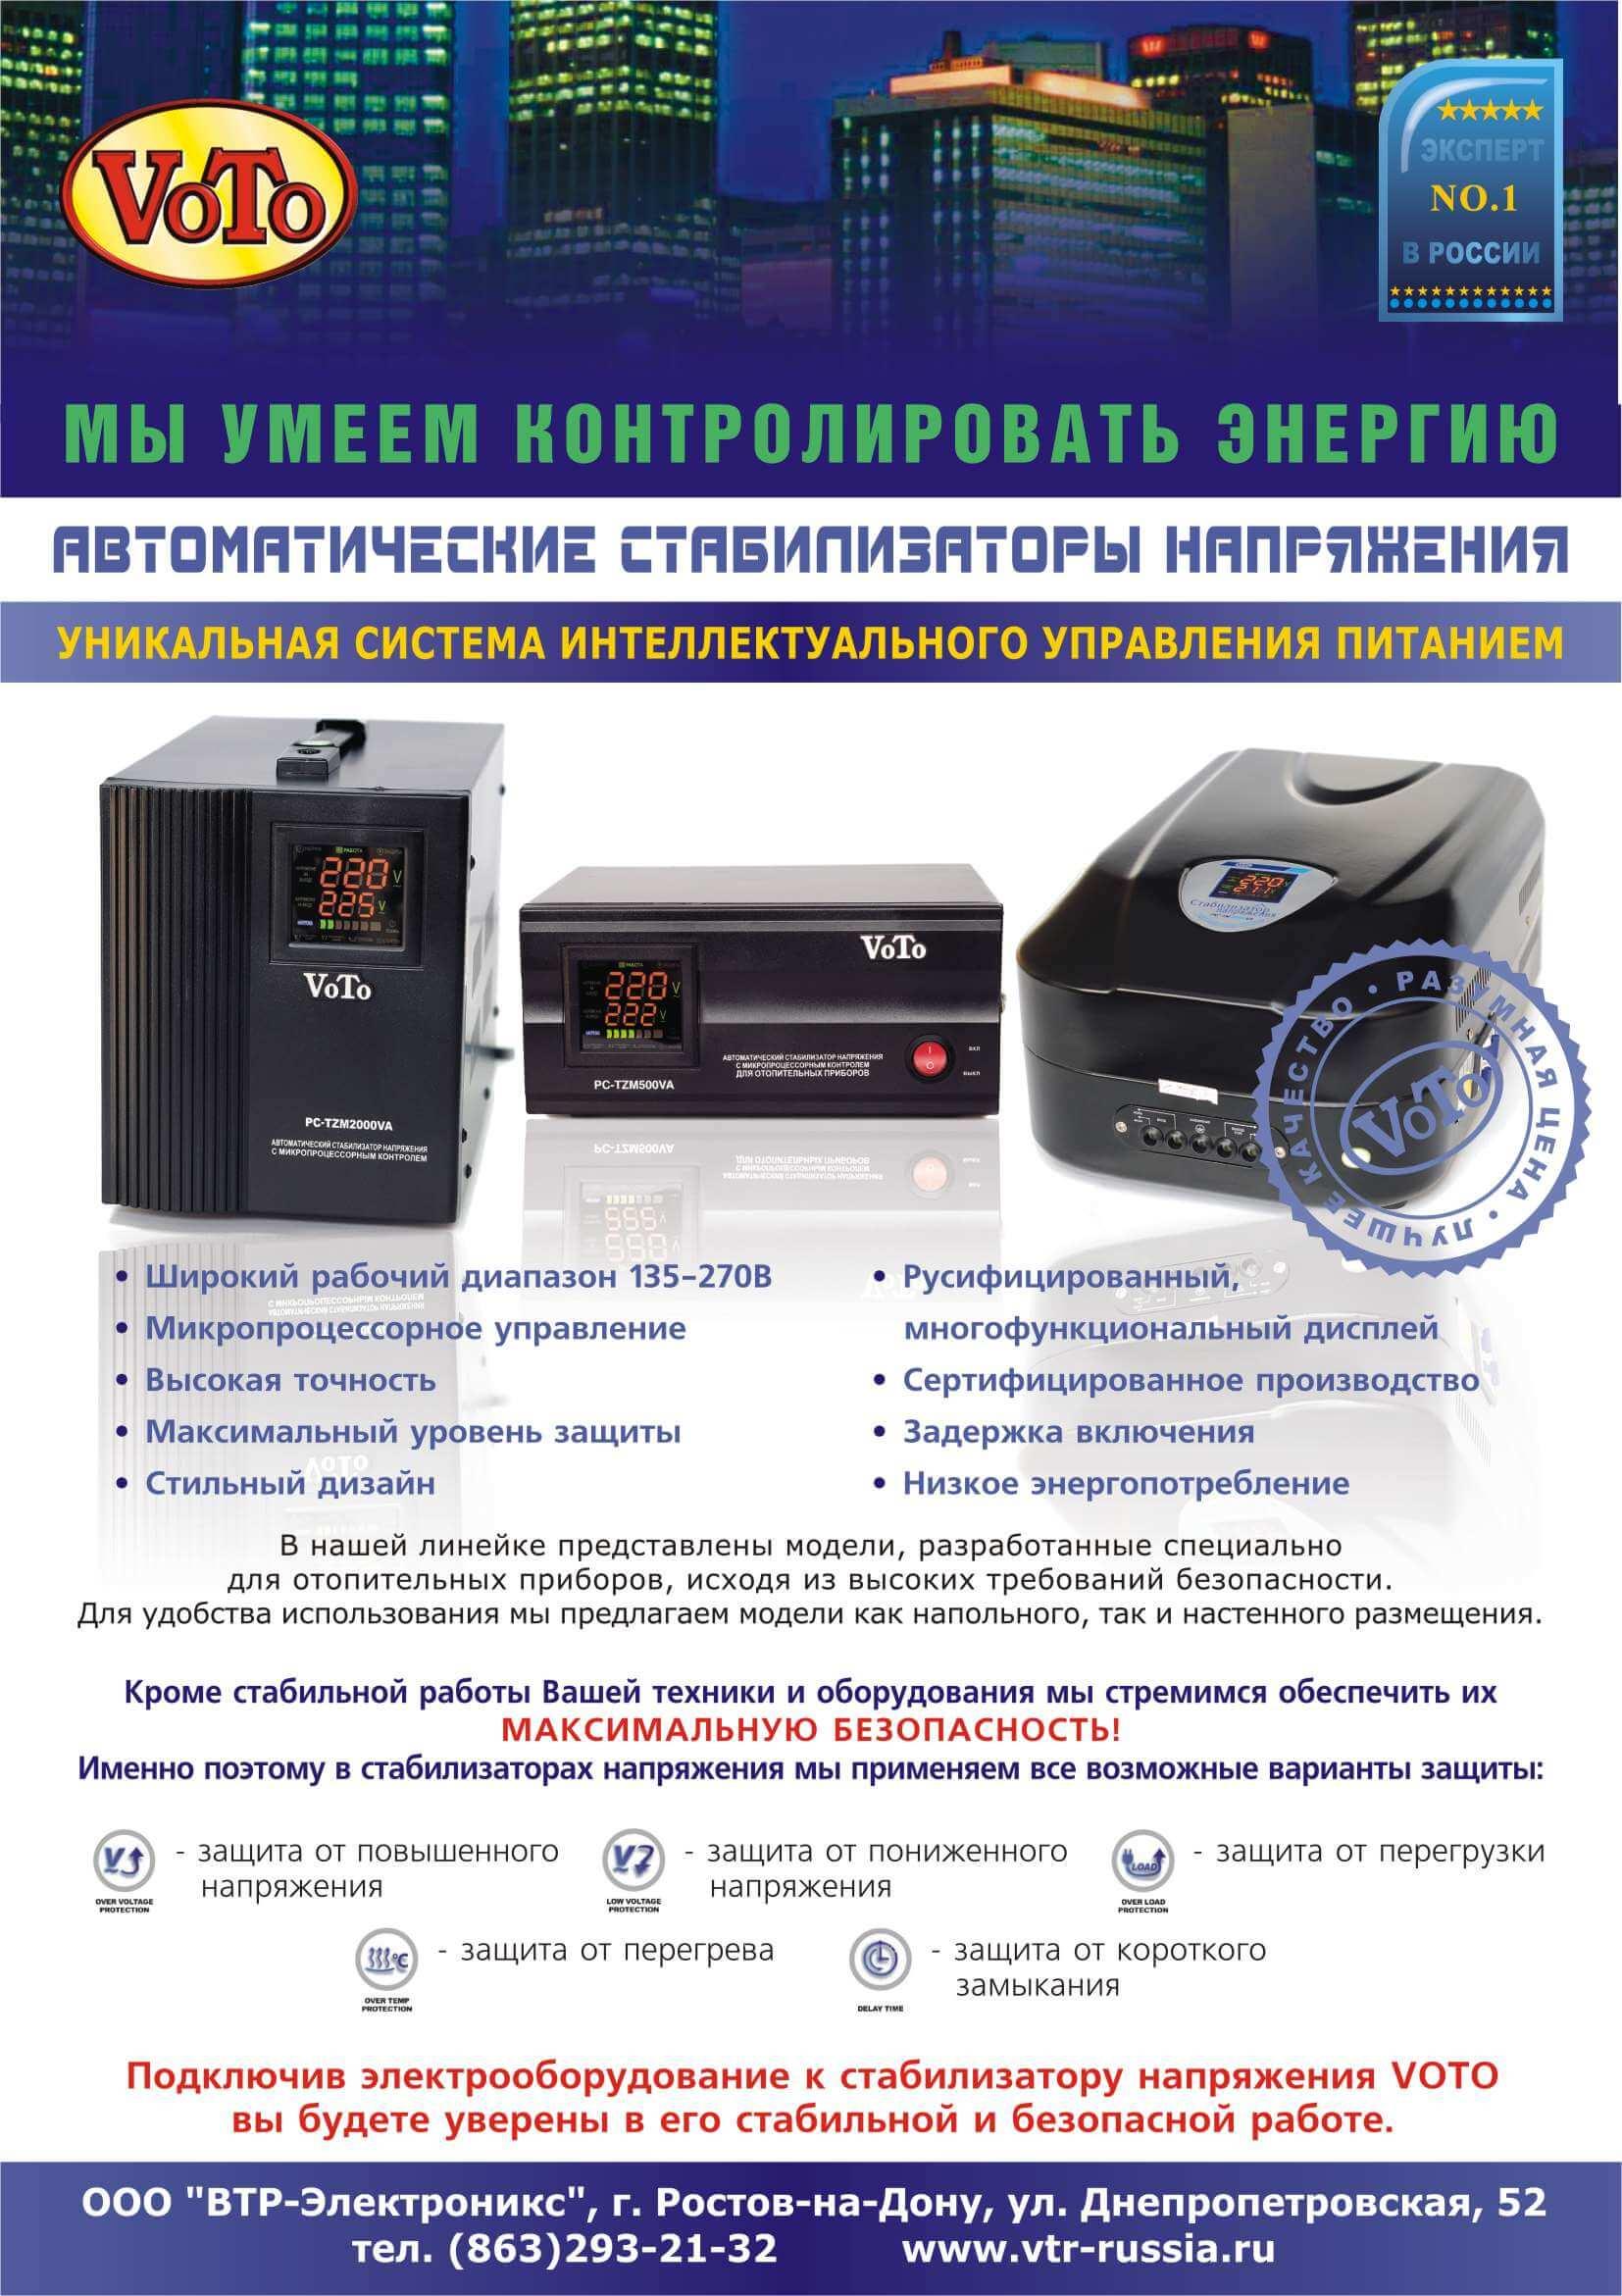 инструкция схема pc-tsd 10000va